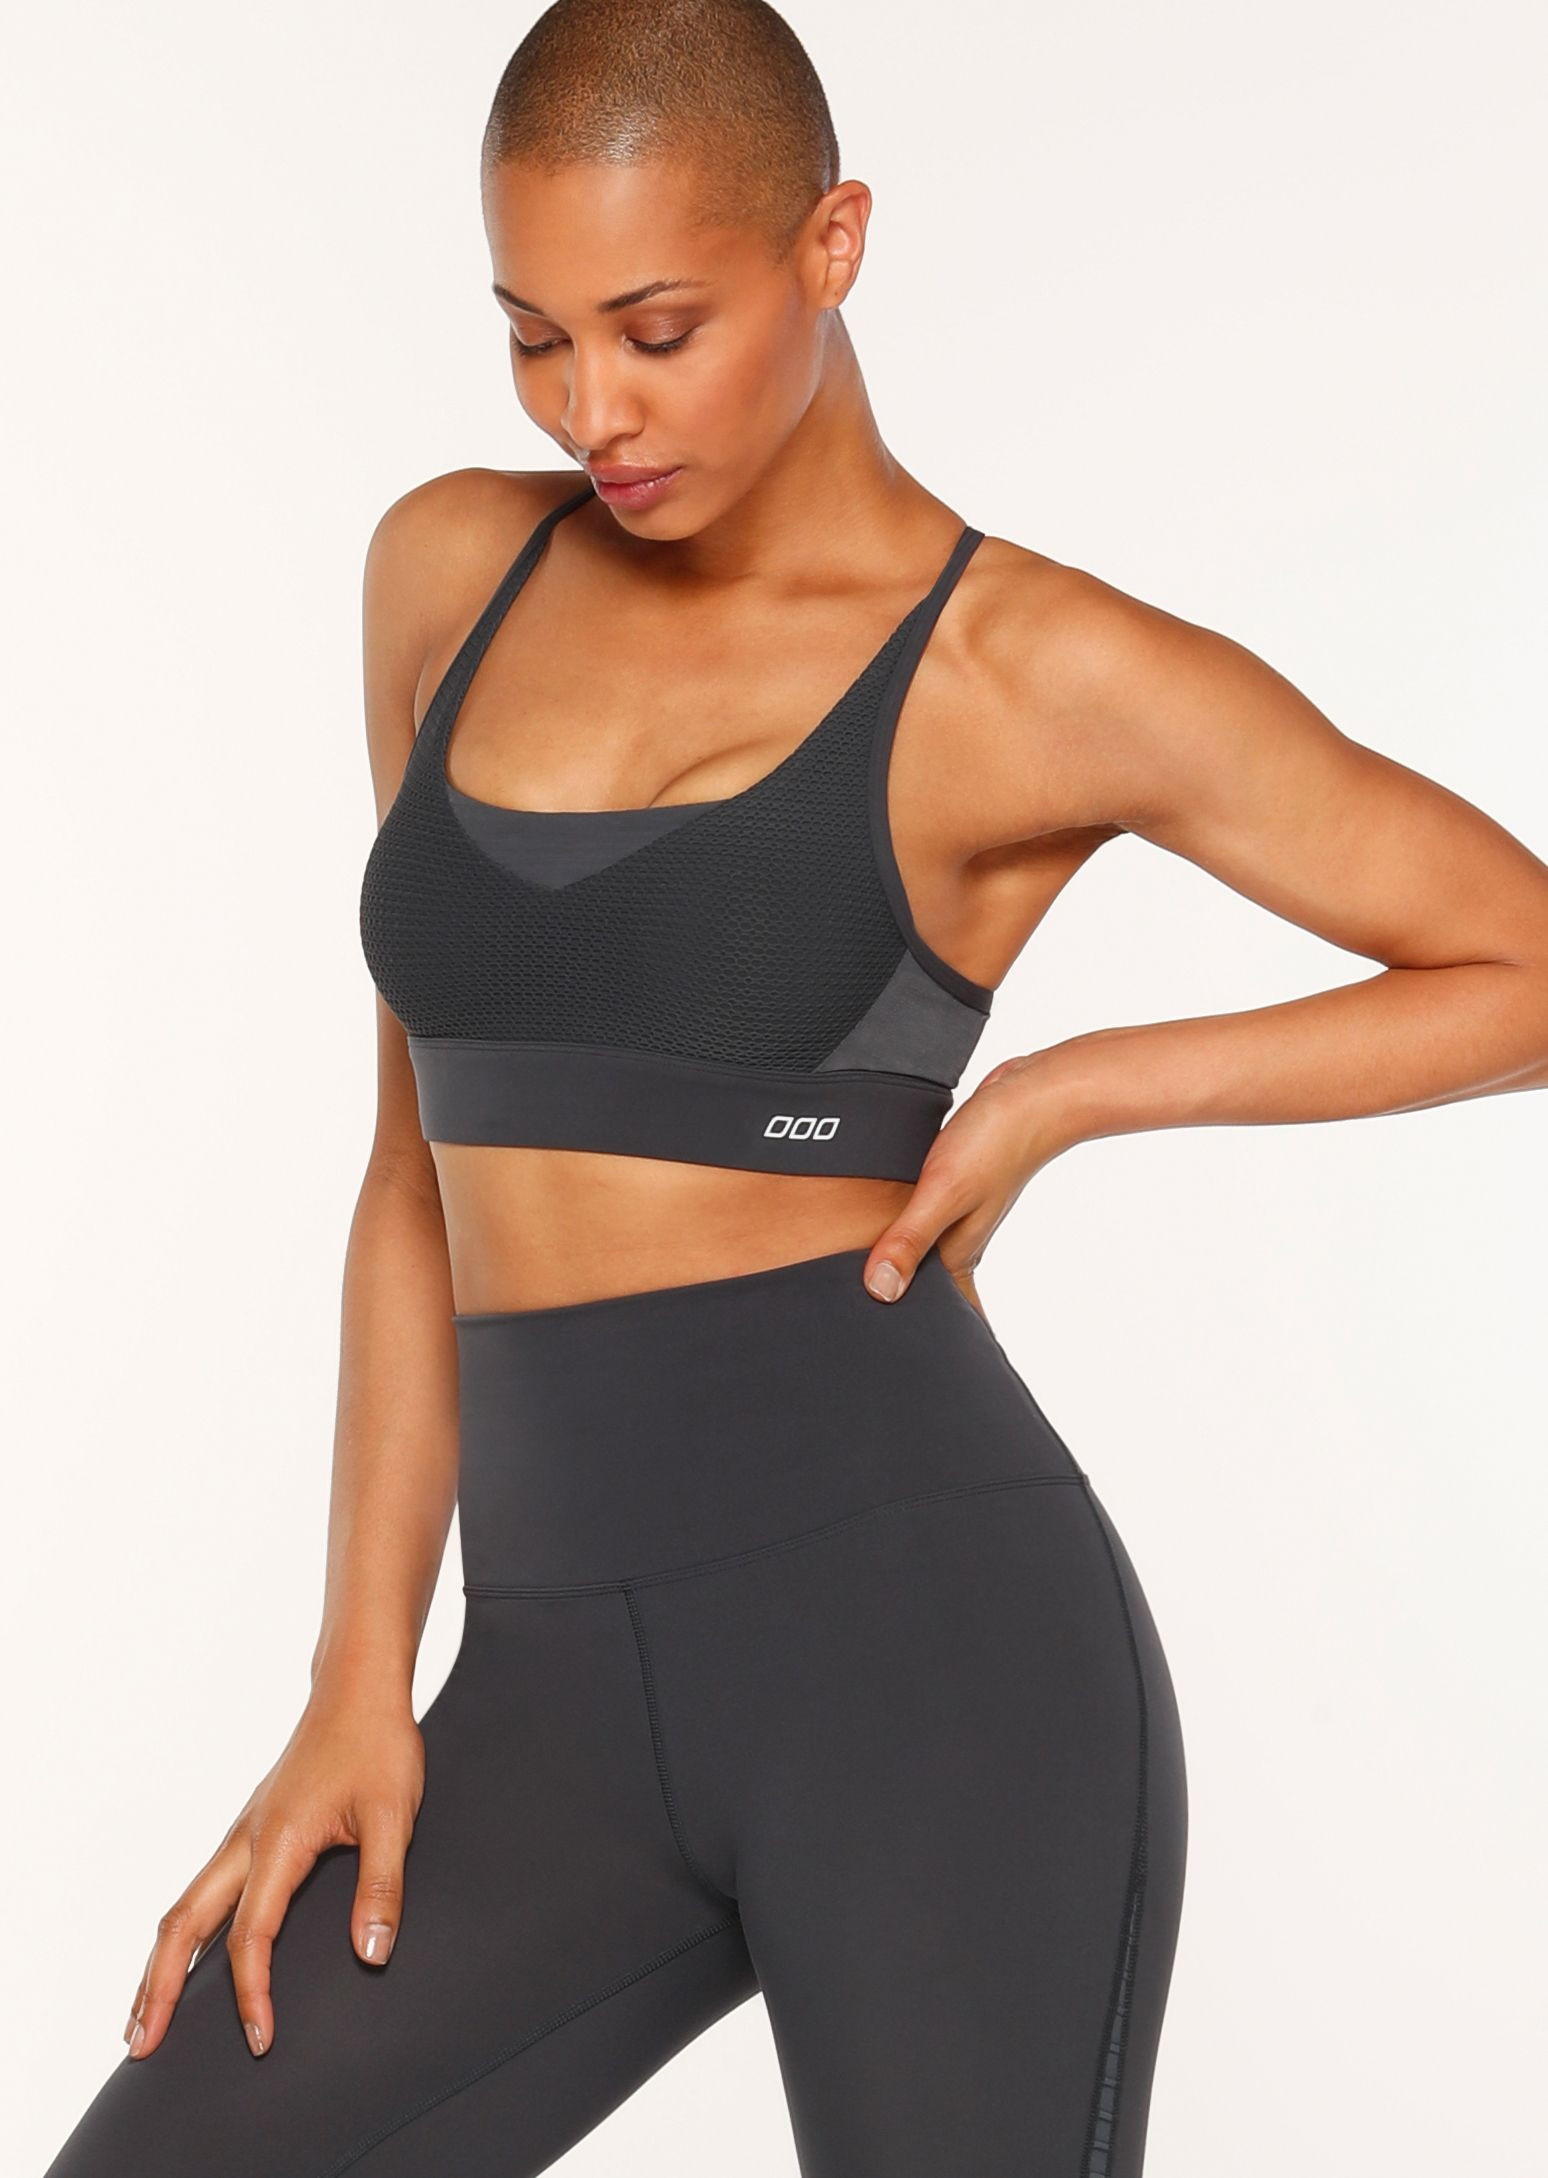 This maximum support sports bra features compressive